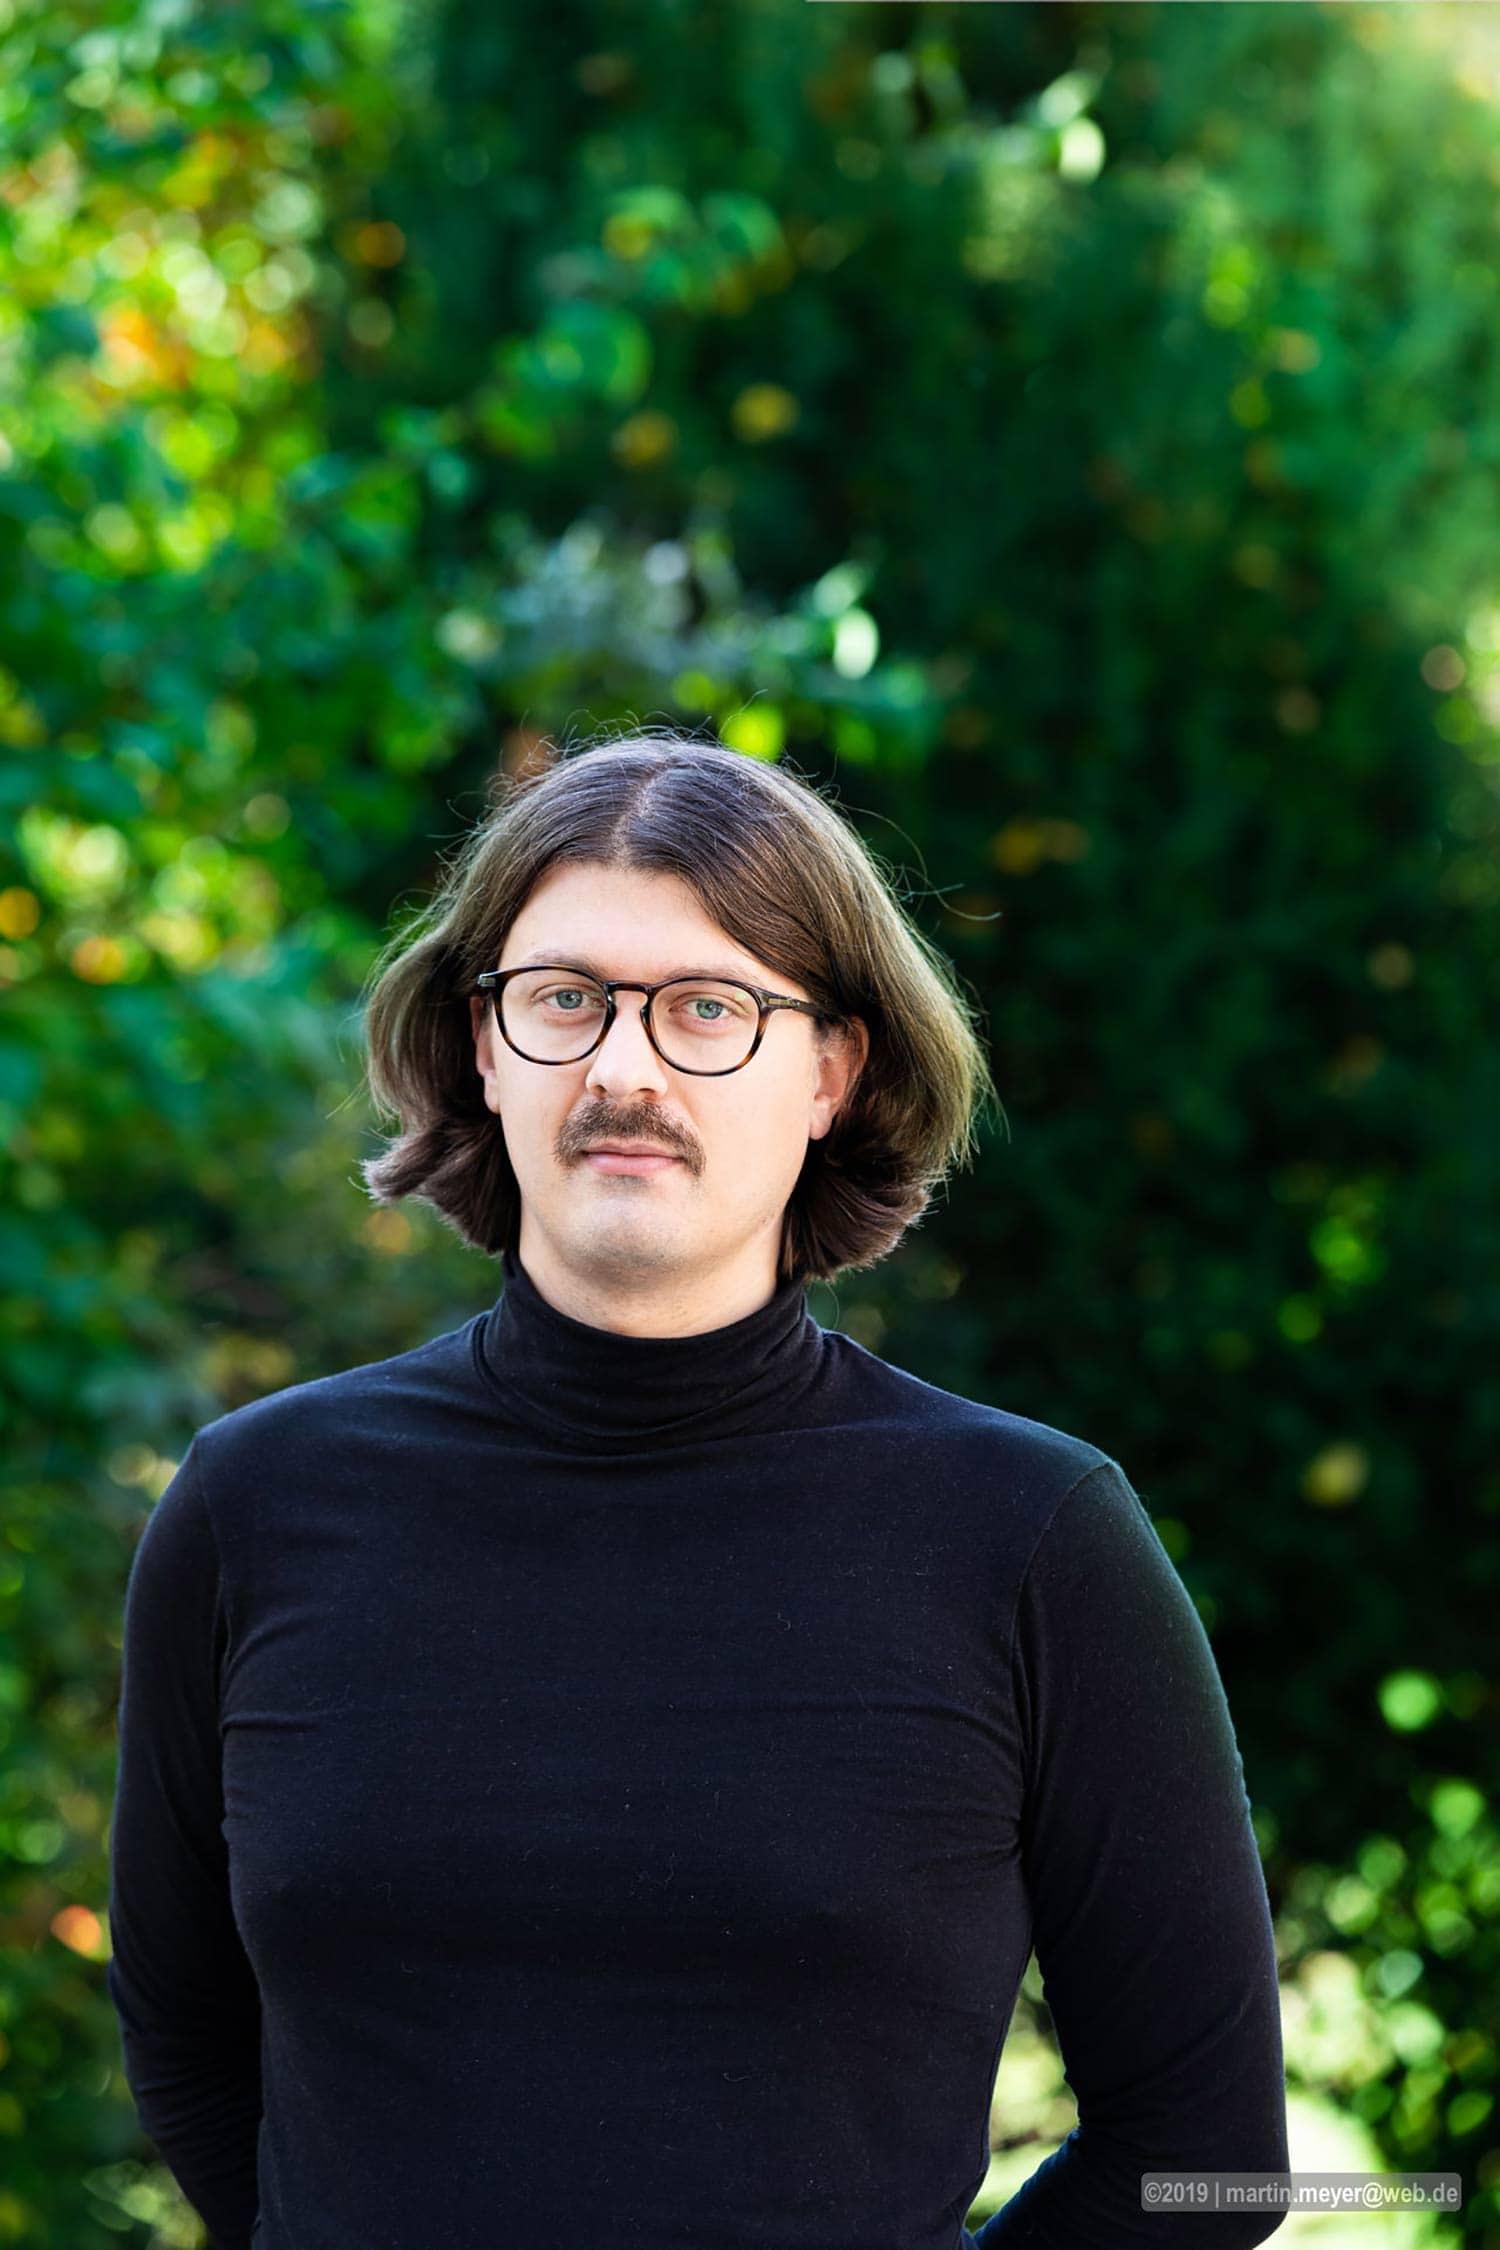 Grüne - Michael Achmann (28) Student Fotos: Bündnis 90/Die Grünen